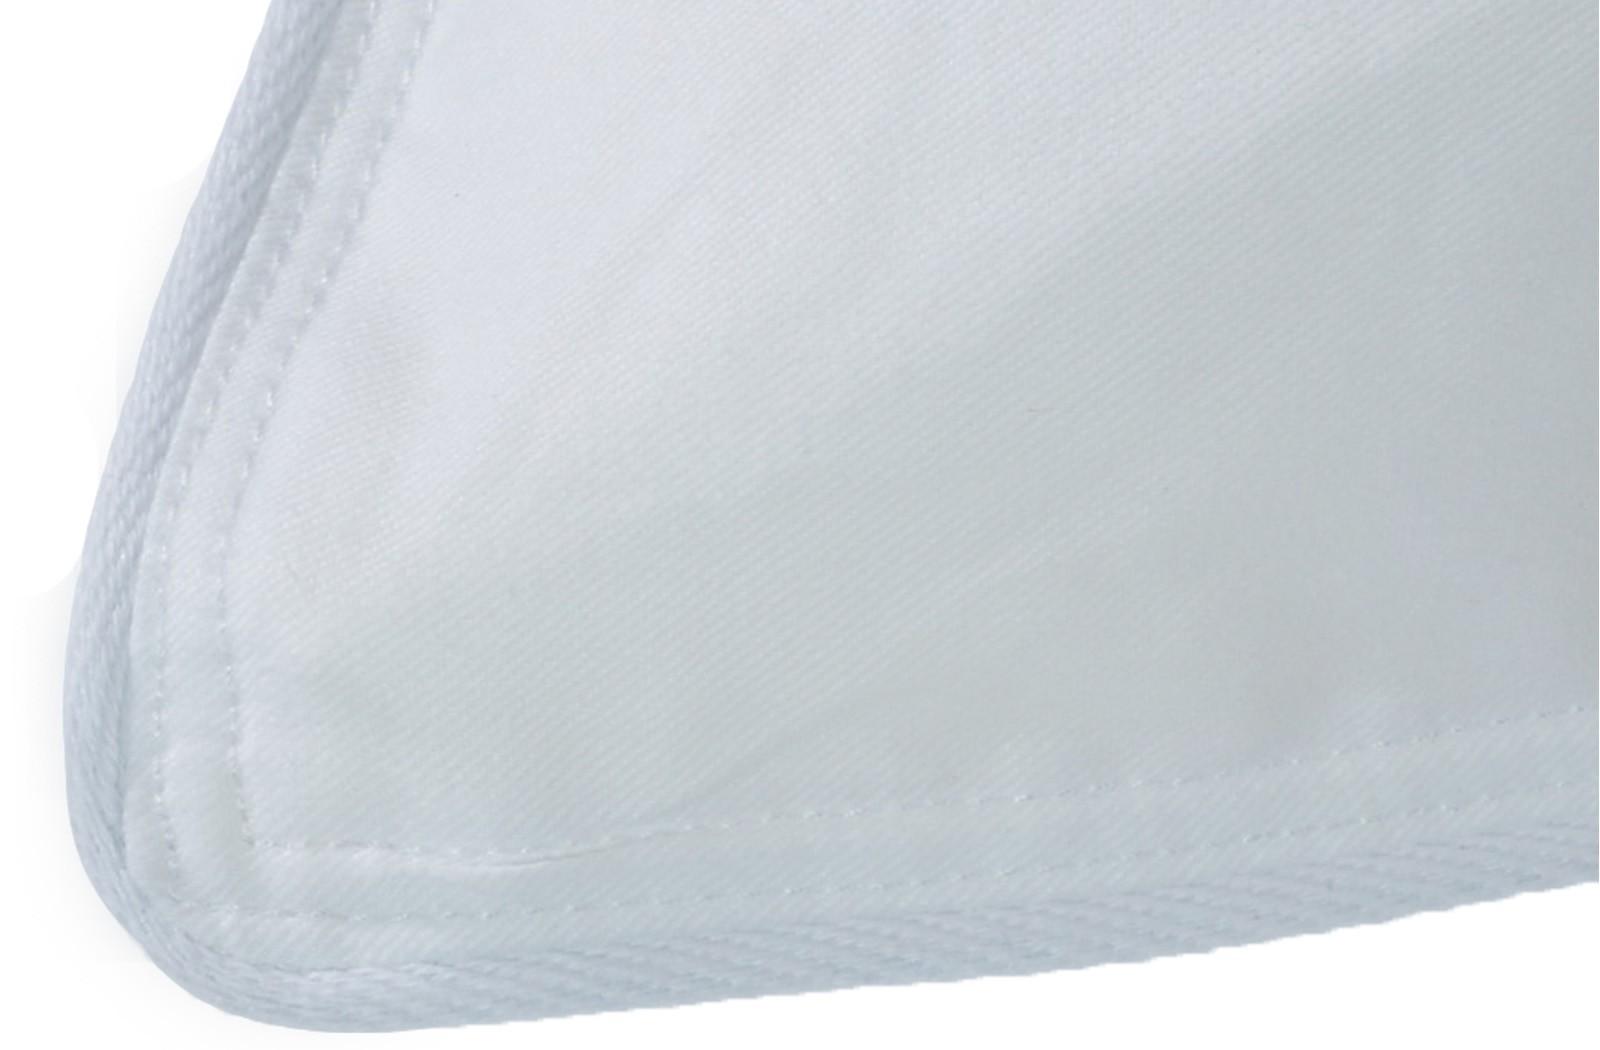 Daunendecke 100% Gänsedaune Winter-Decke 155x220 Franzi-3 – Bild 5